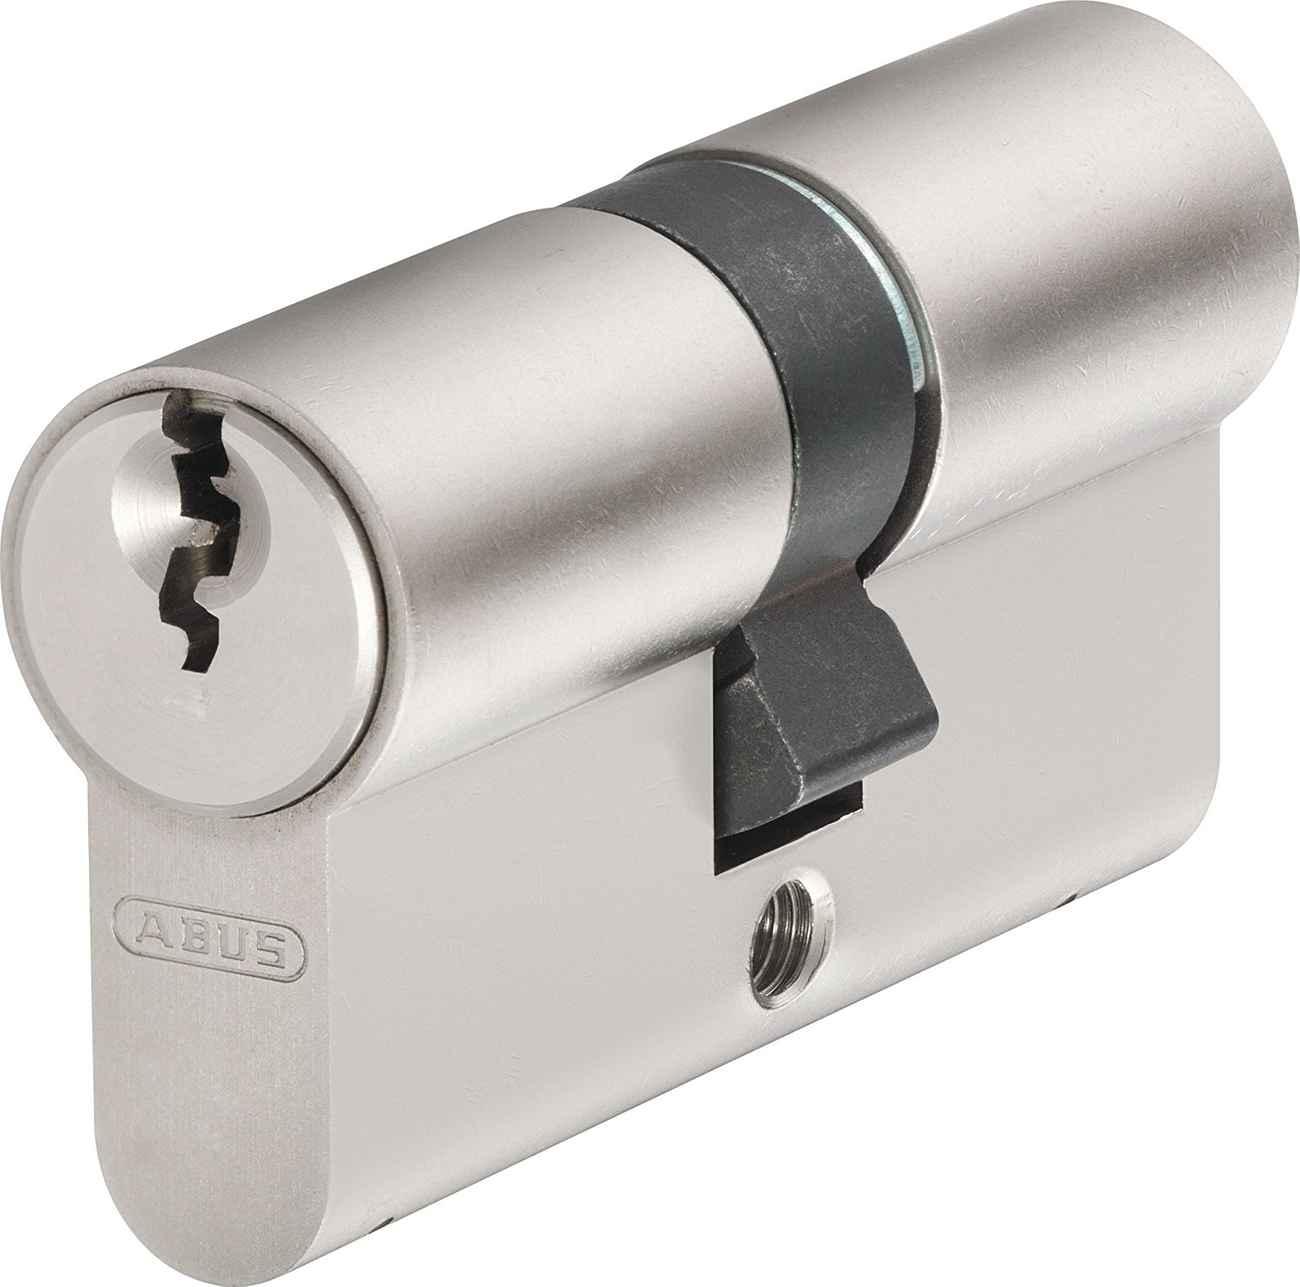 Abus Profilzylinder D6X 28/34 mm, 5 Schlüssel, Codekarte – Bild 1